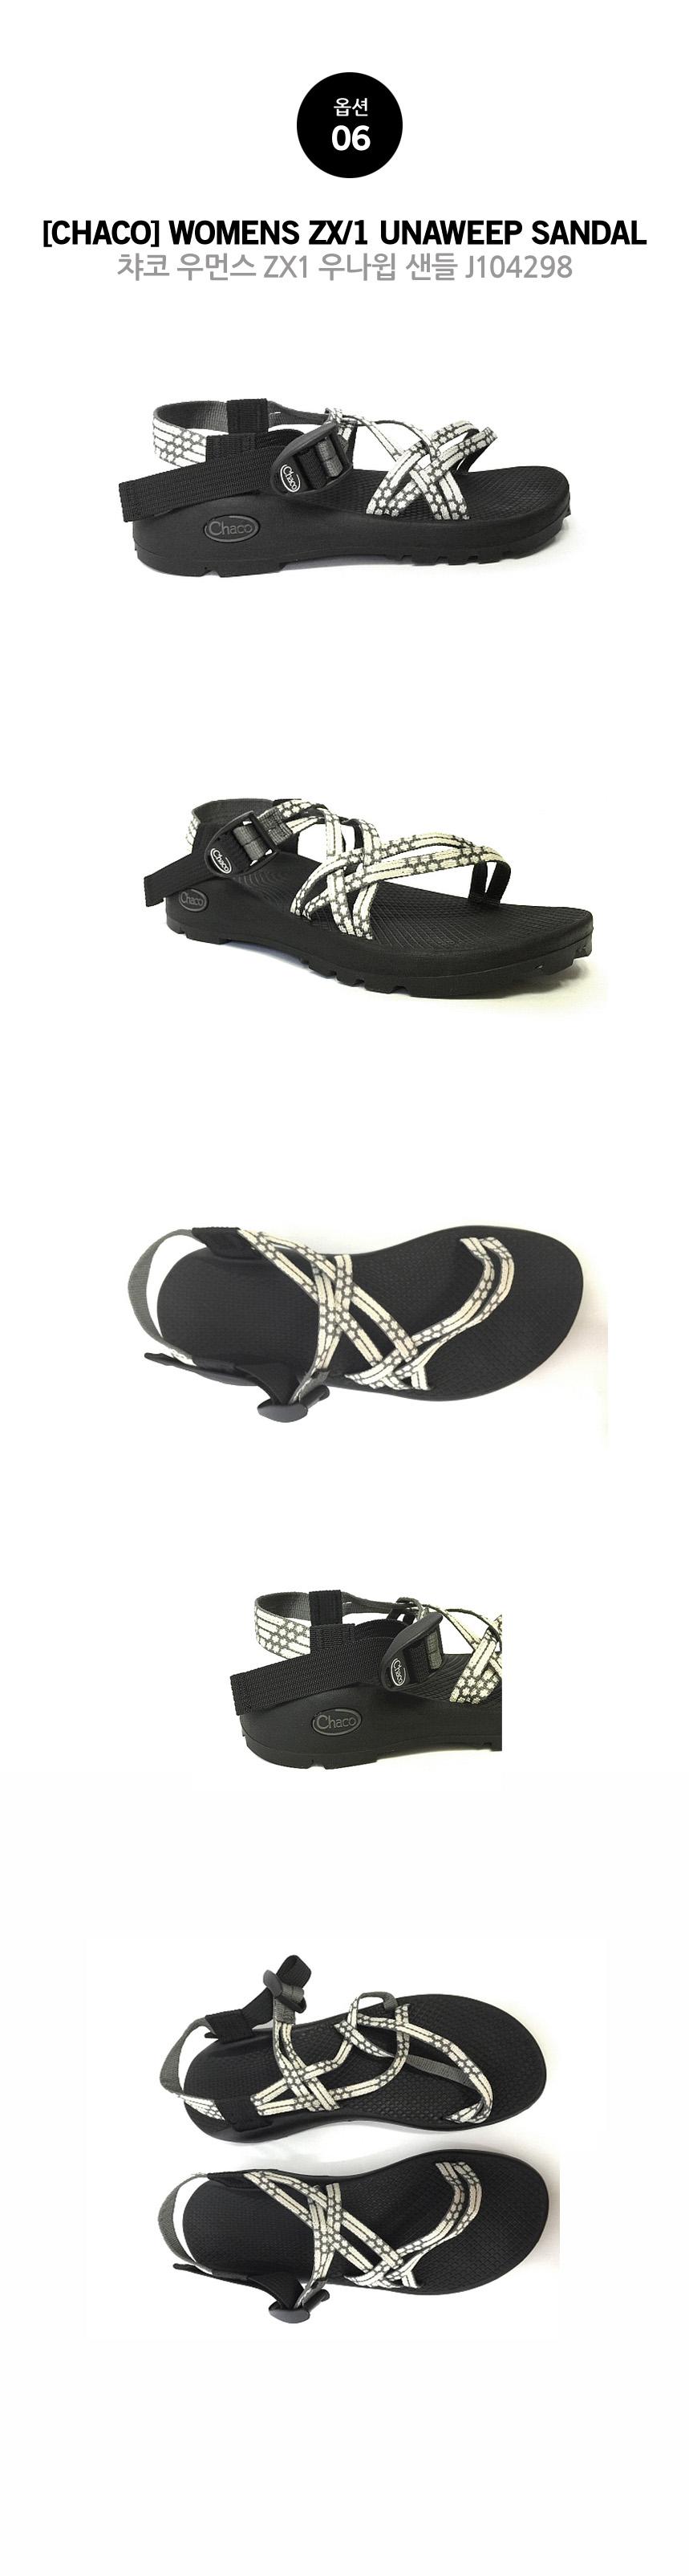 Yampa Unaweep Black Sandal 220~270 SIZE